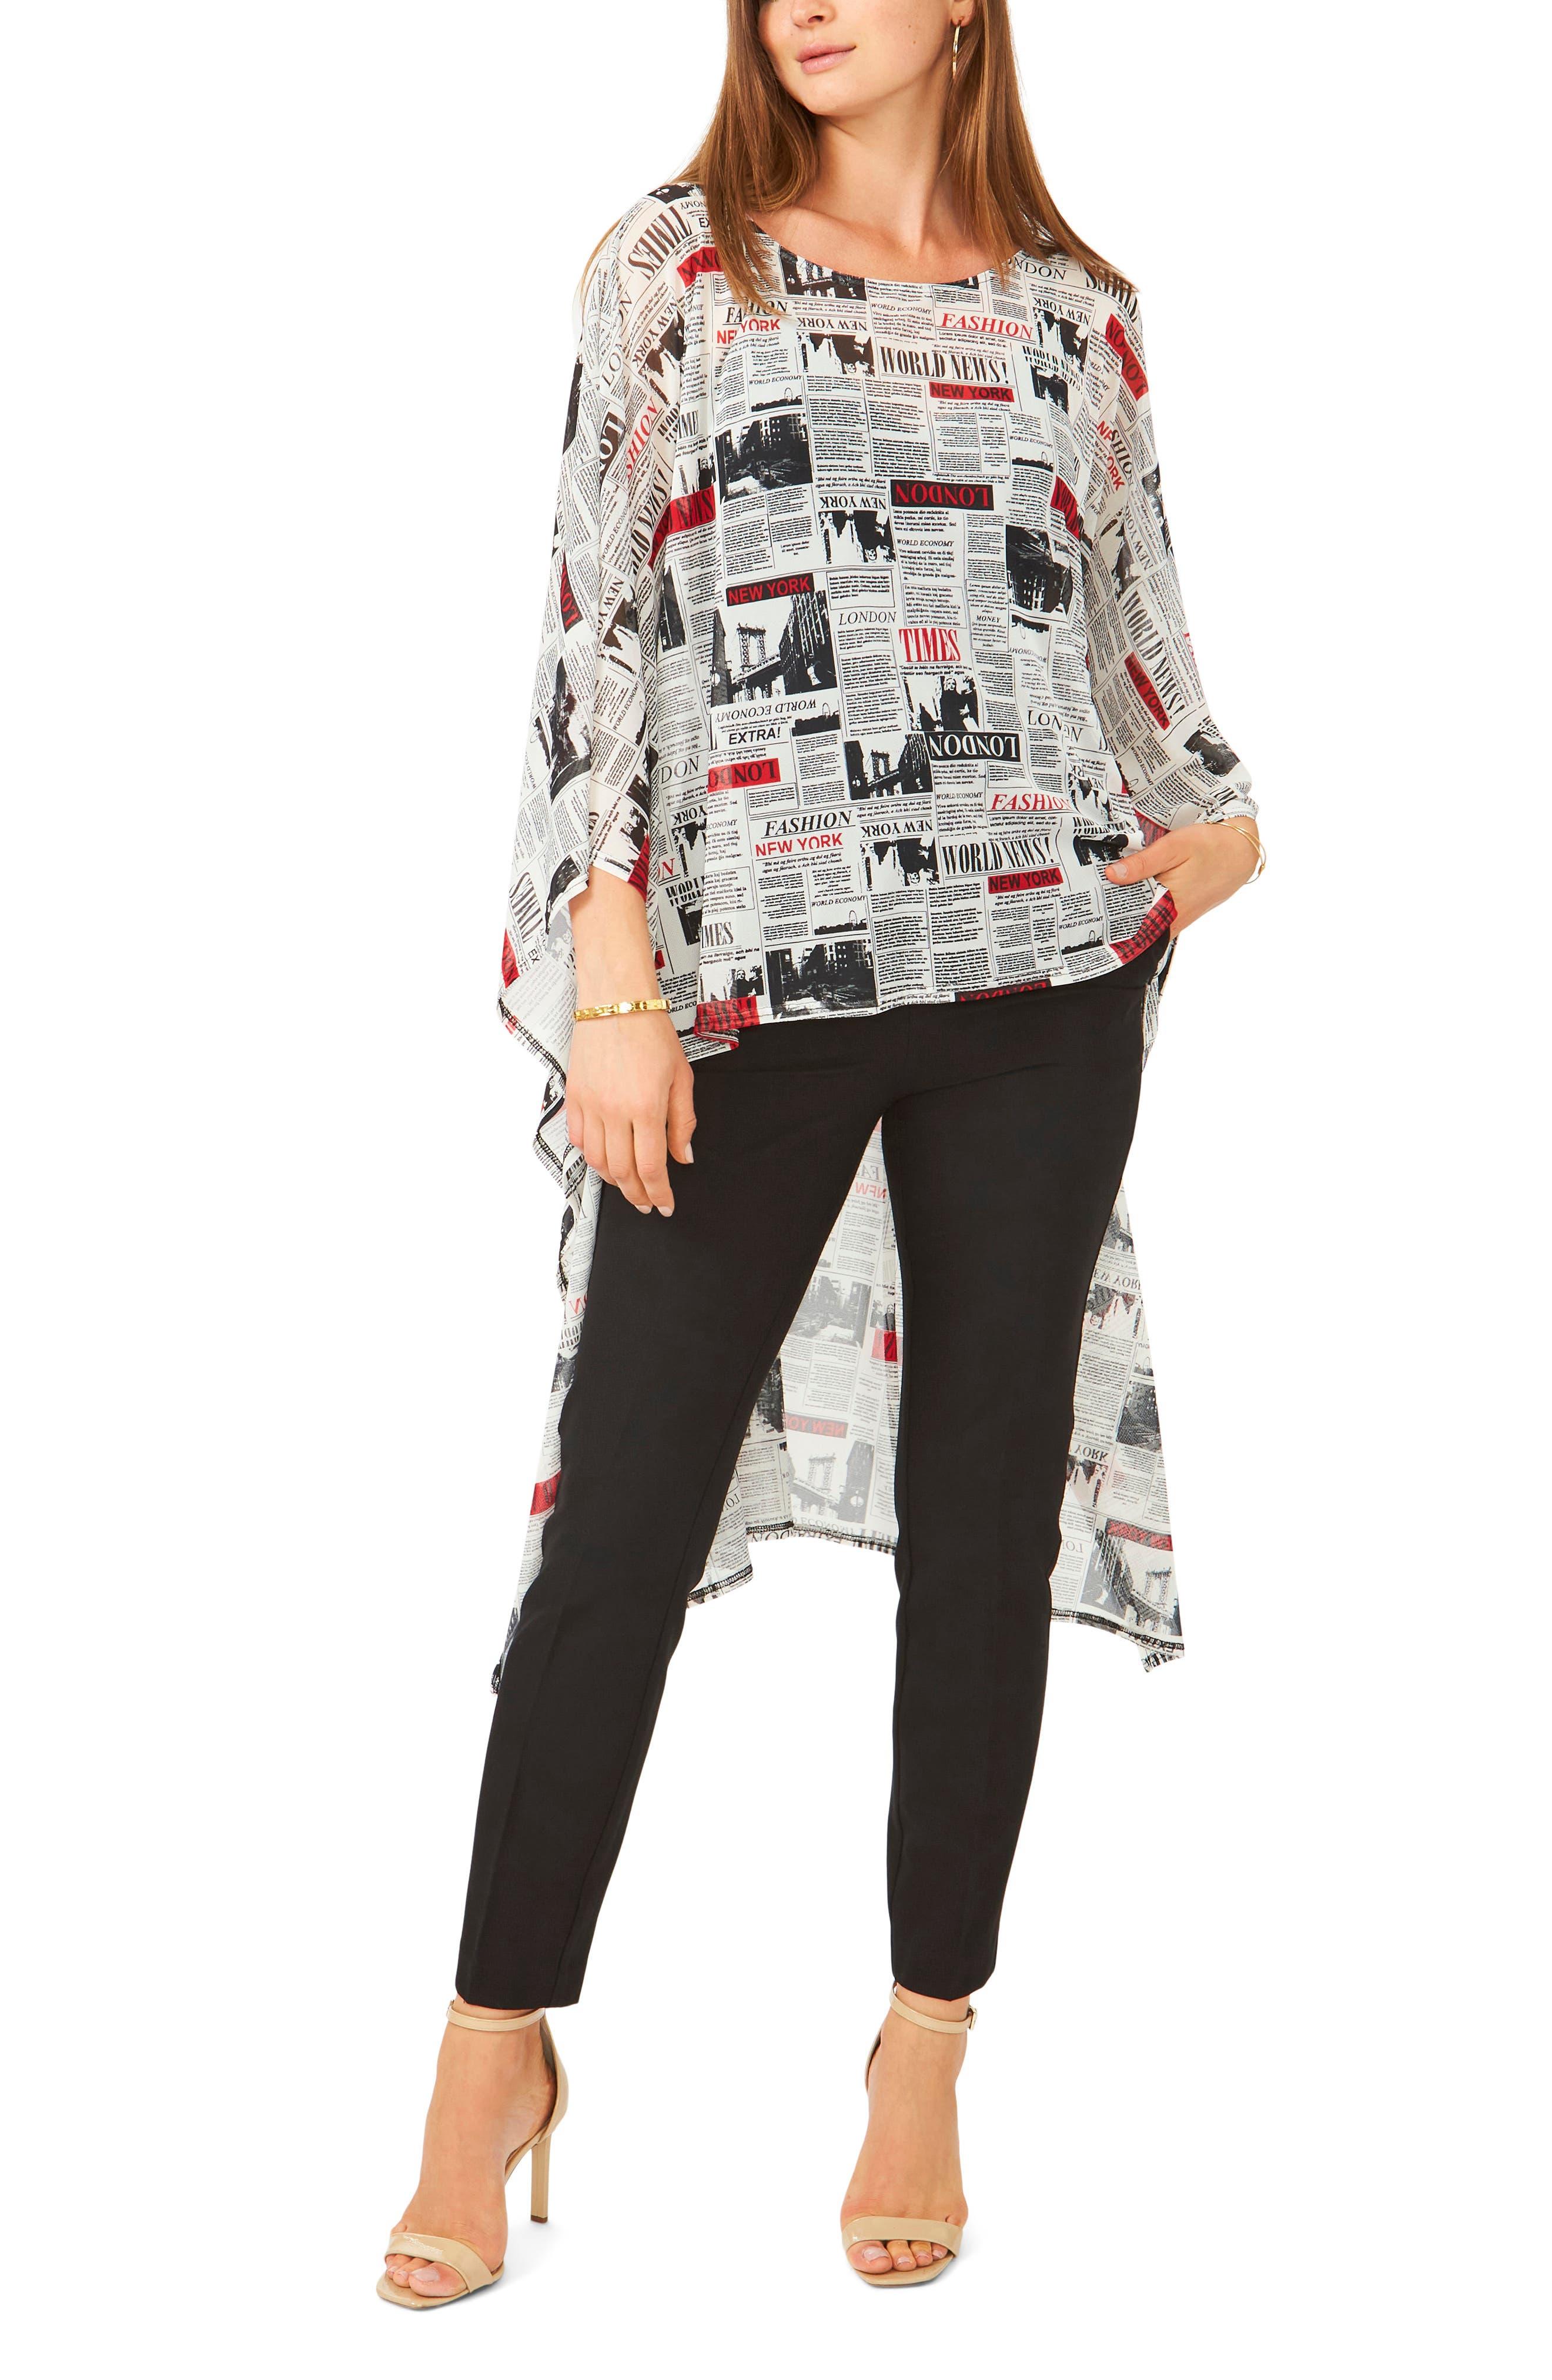 Newsprint High-Low Tunic Top